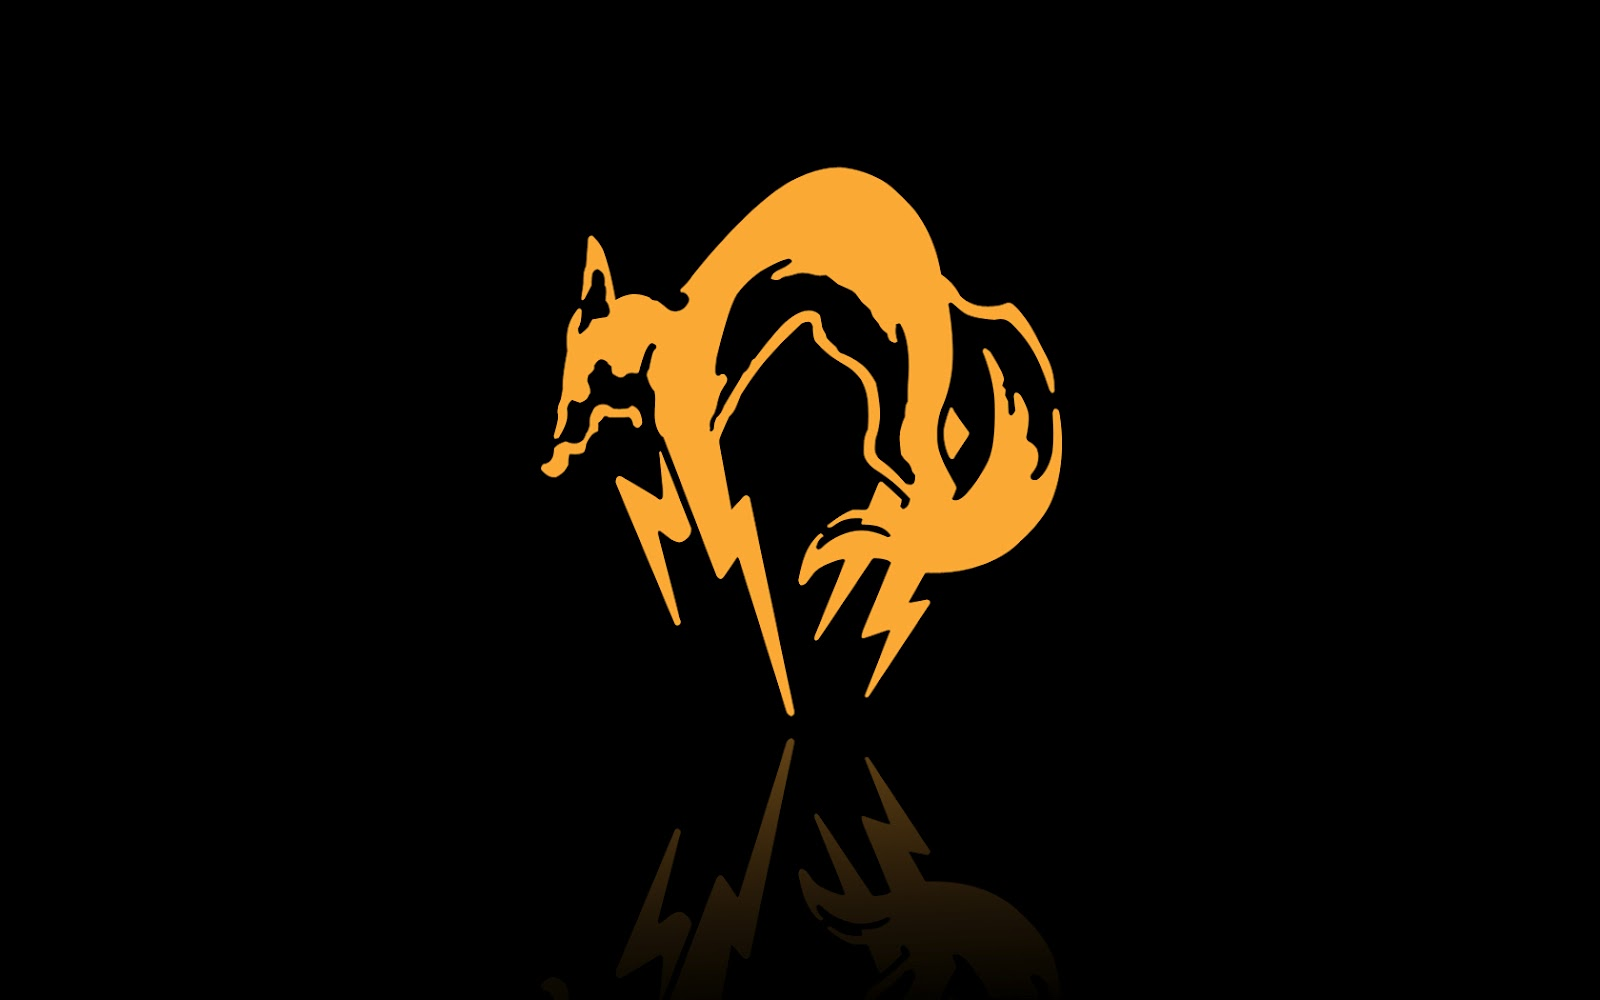 metal+gear+solid+mgs+fox+unit+logo+trade